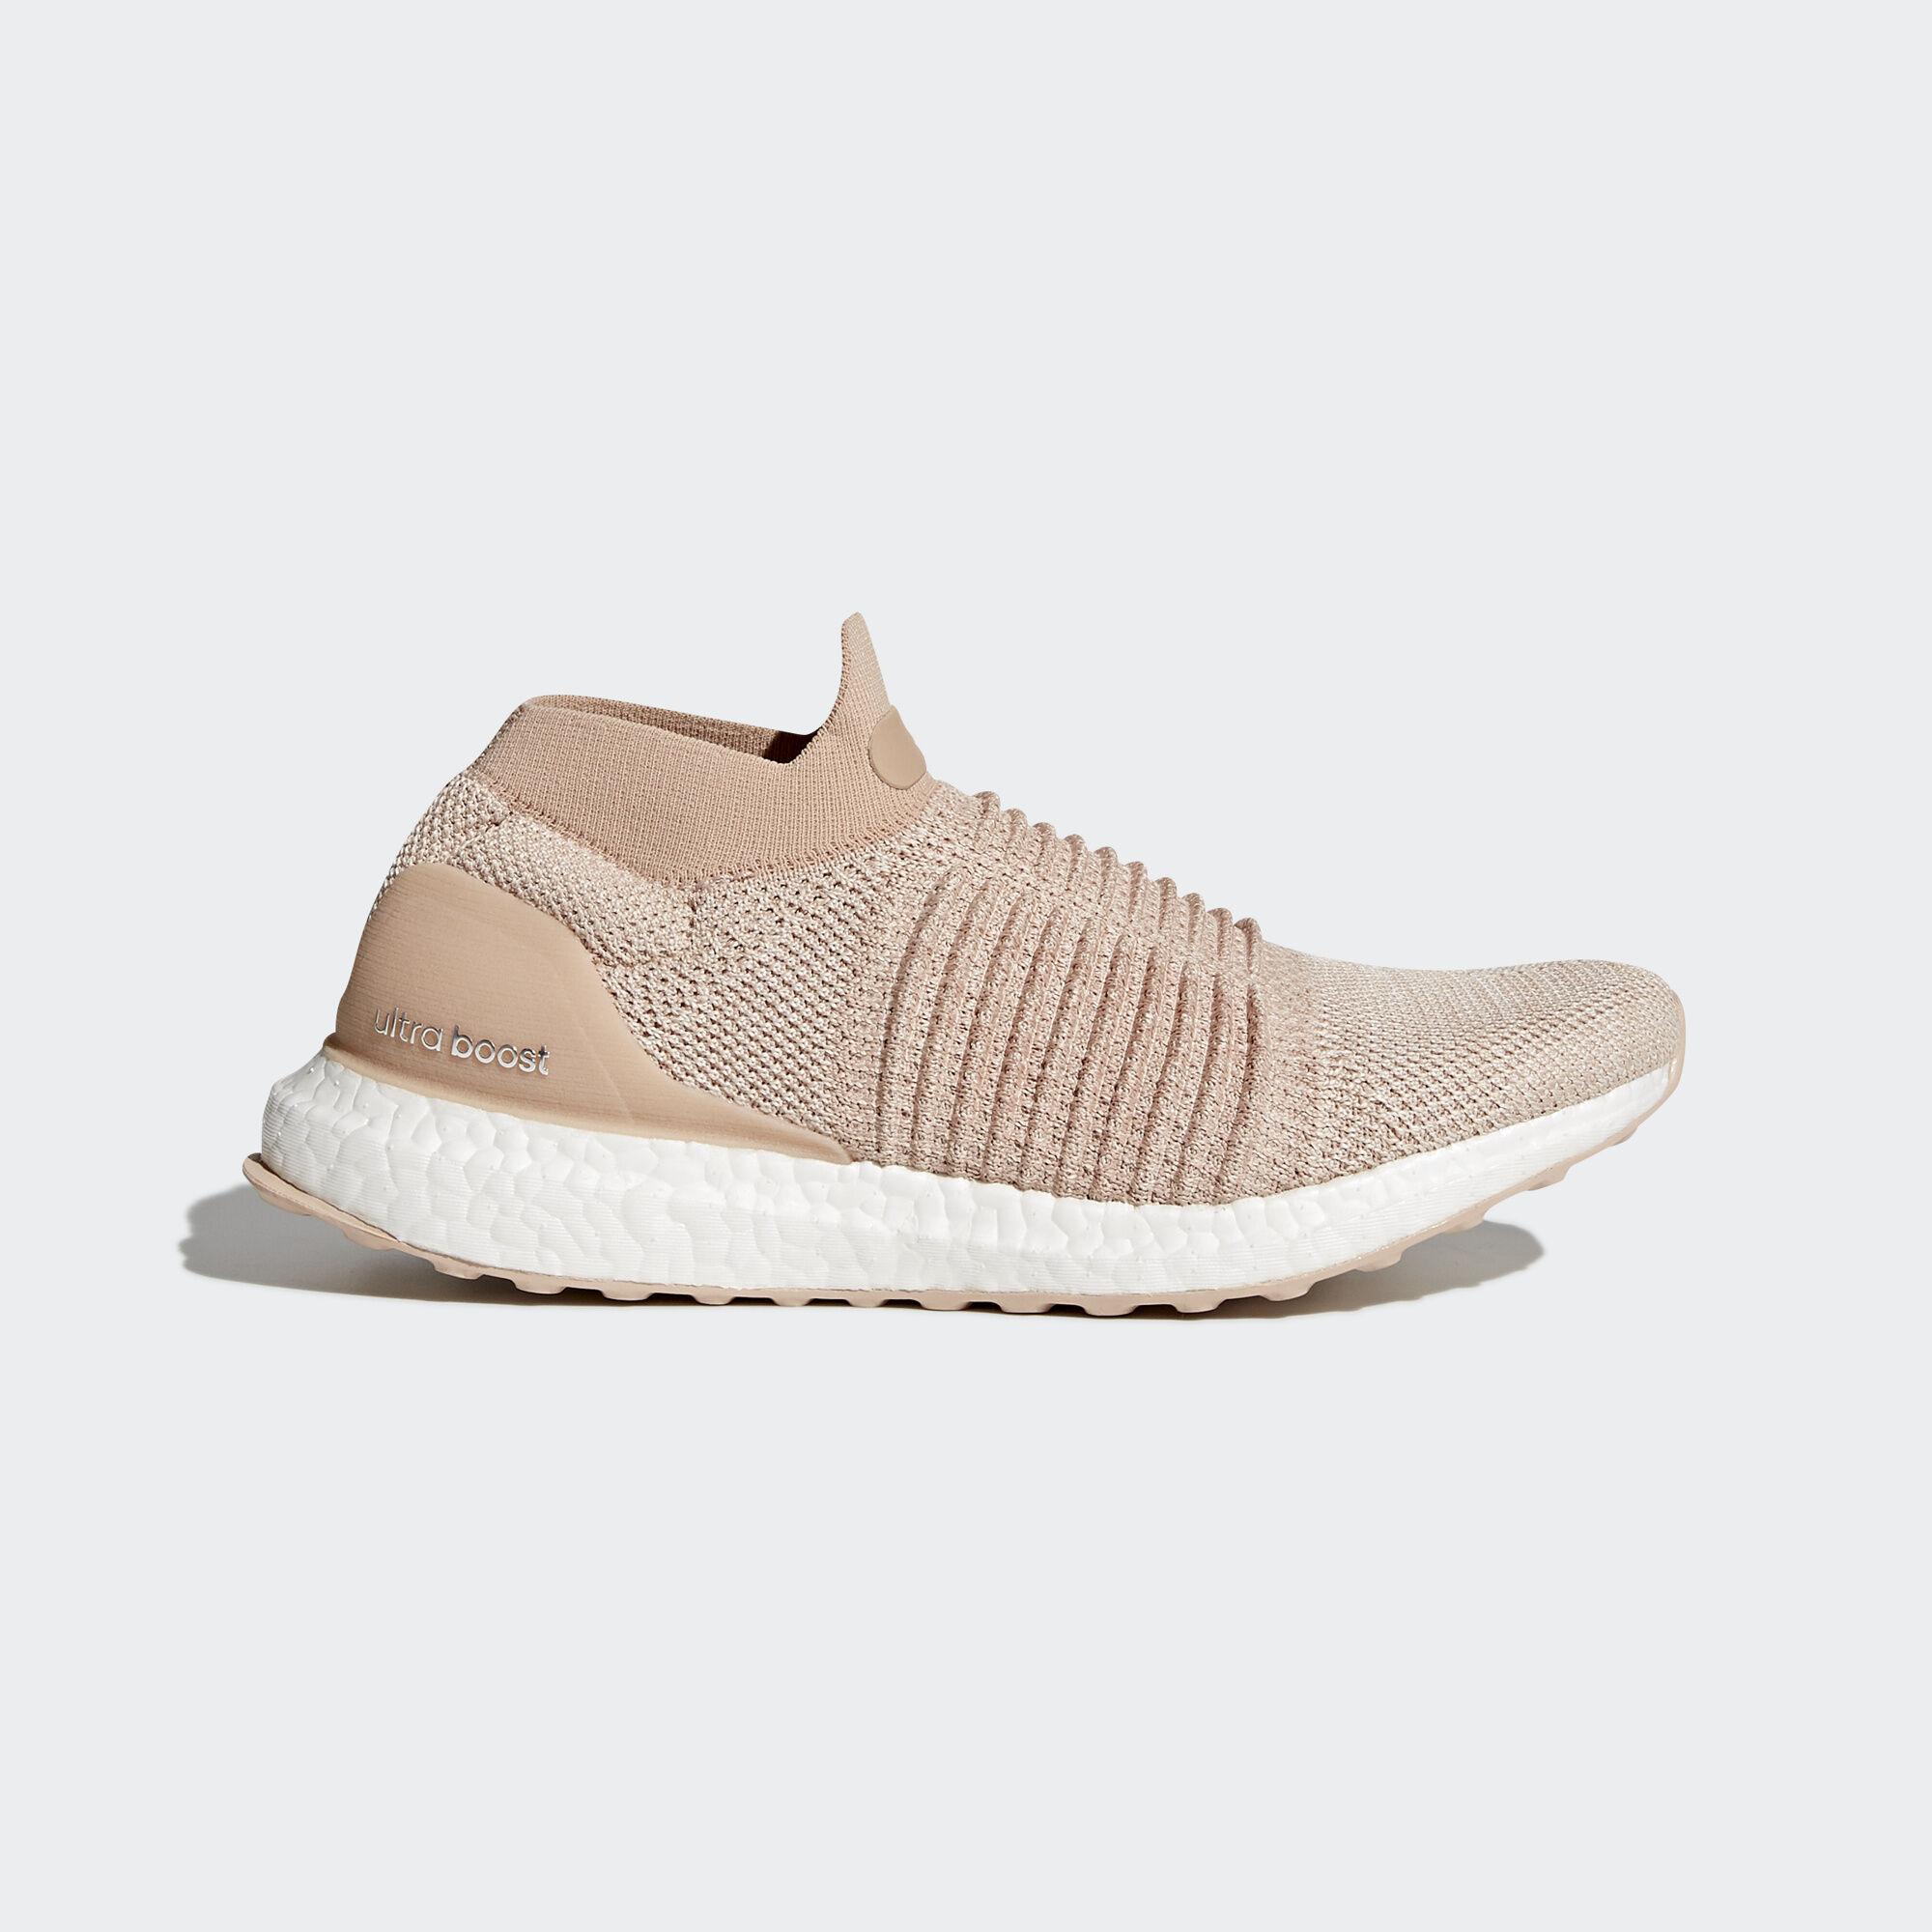 Adidas Training Shoes Stella